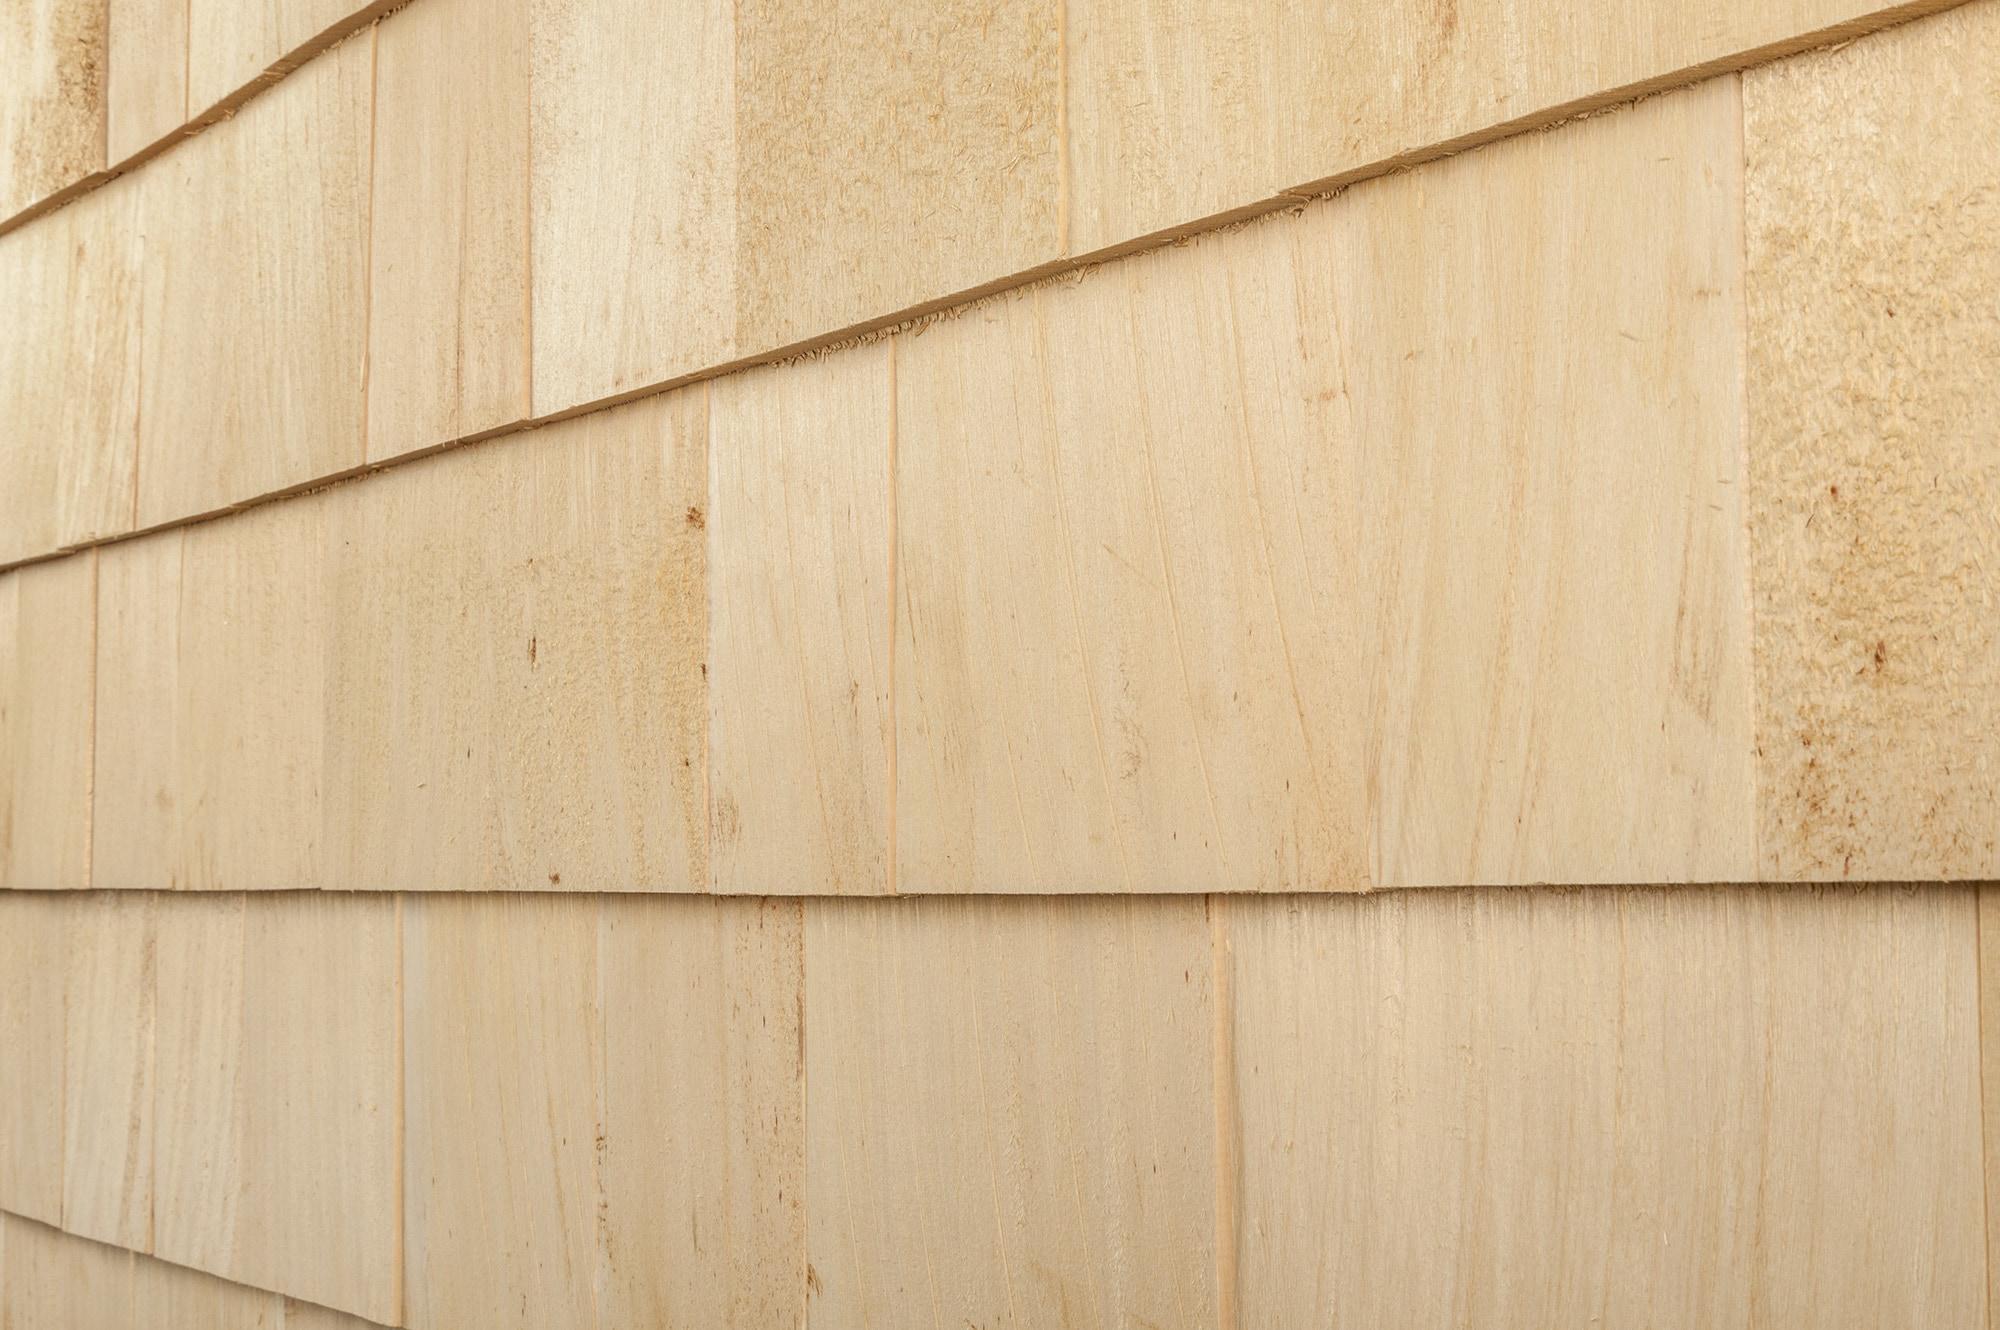 Cedar west yellow cedar siding shingles pallets r r 18 1 for Wood shingle siding cost